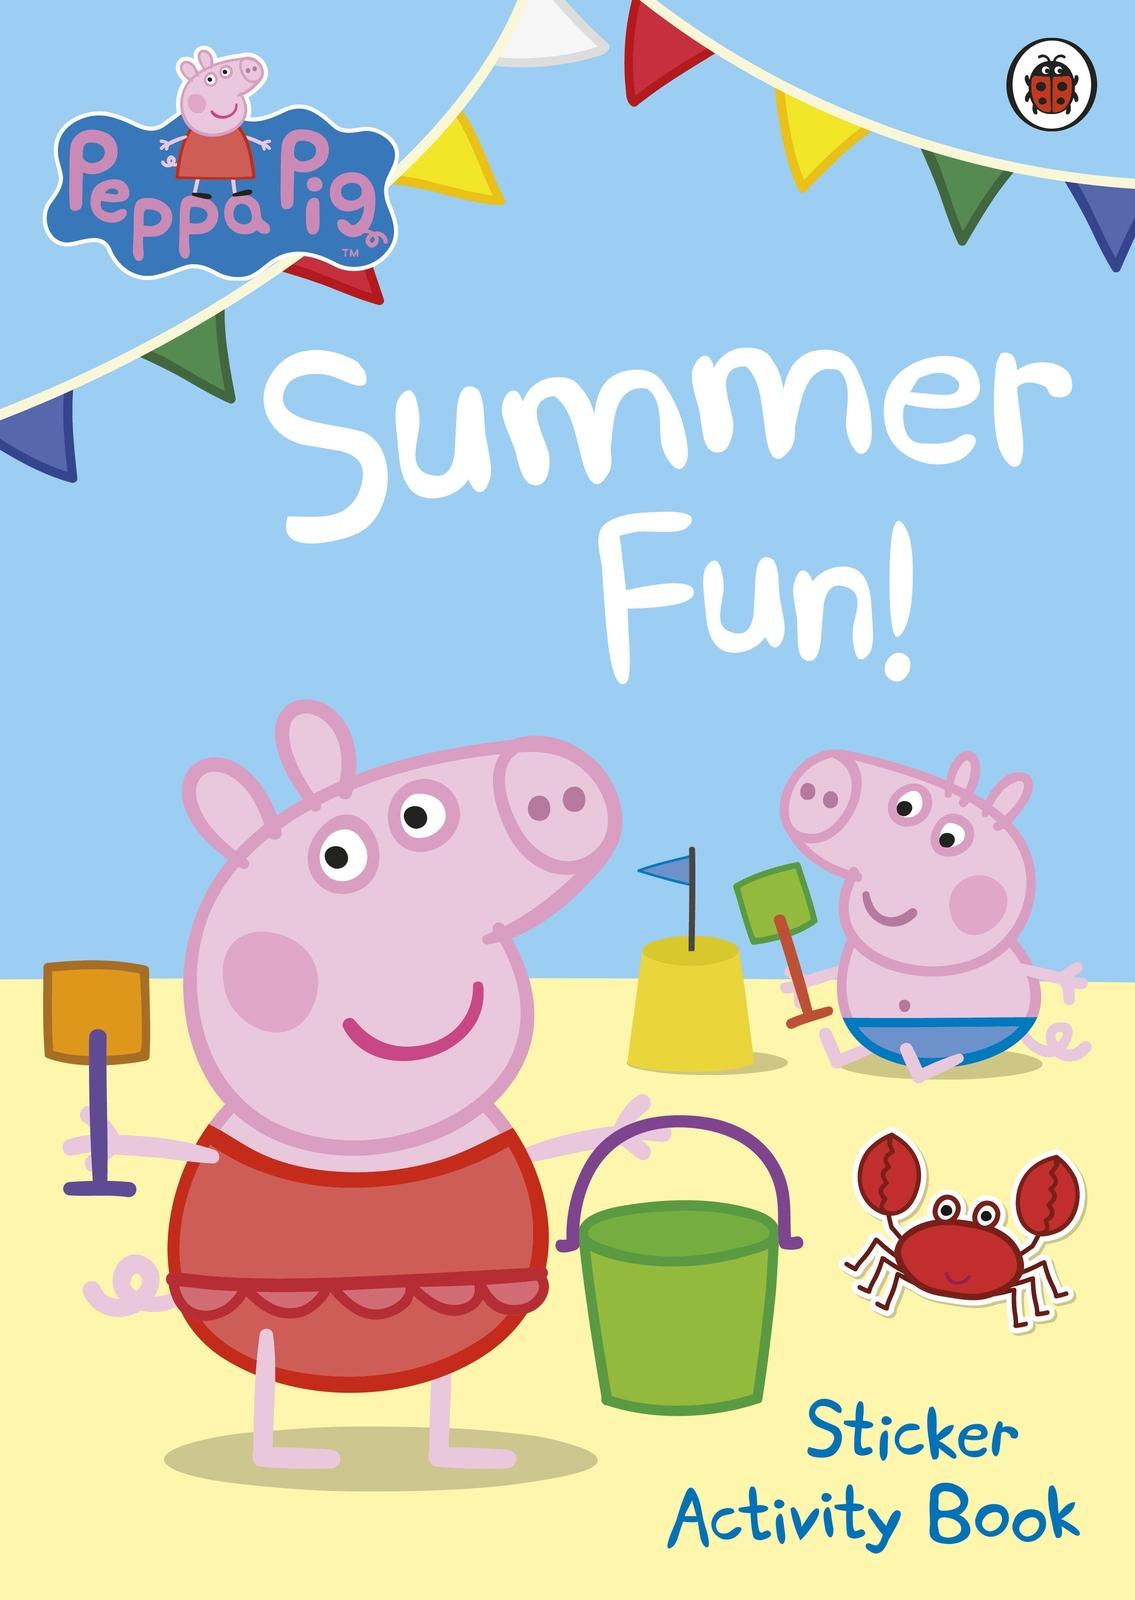 Peppa Pig: Summer Fun! Sticker Activity Book image